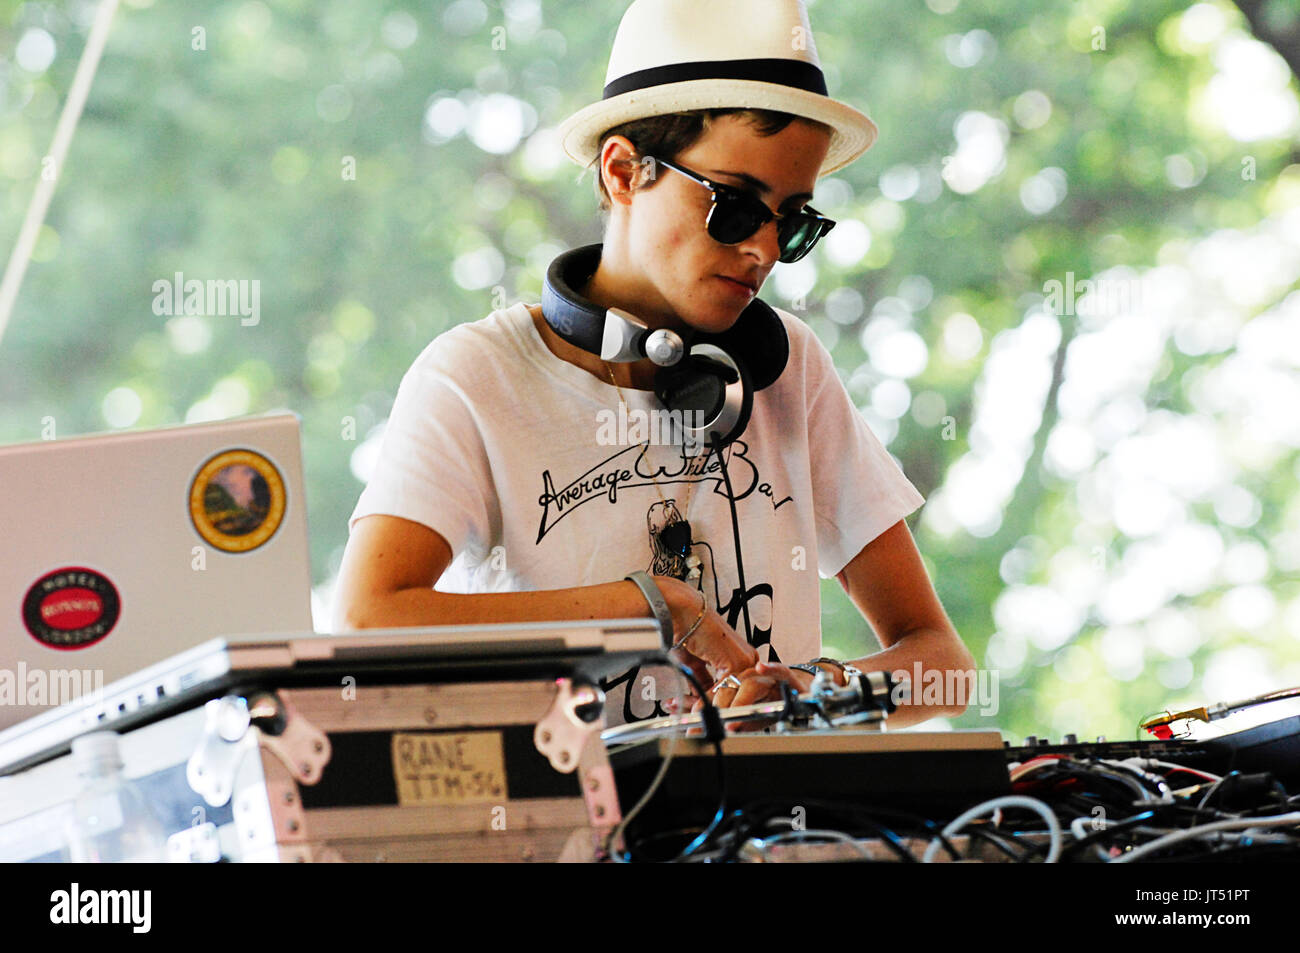 DJ Samantha Ronson performs 2008 Lollapalooza Music Festival Grant Park Chicago. - Stock Image